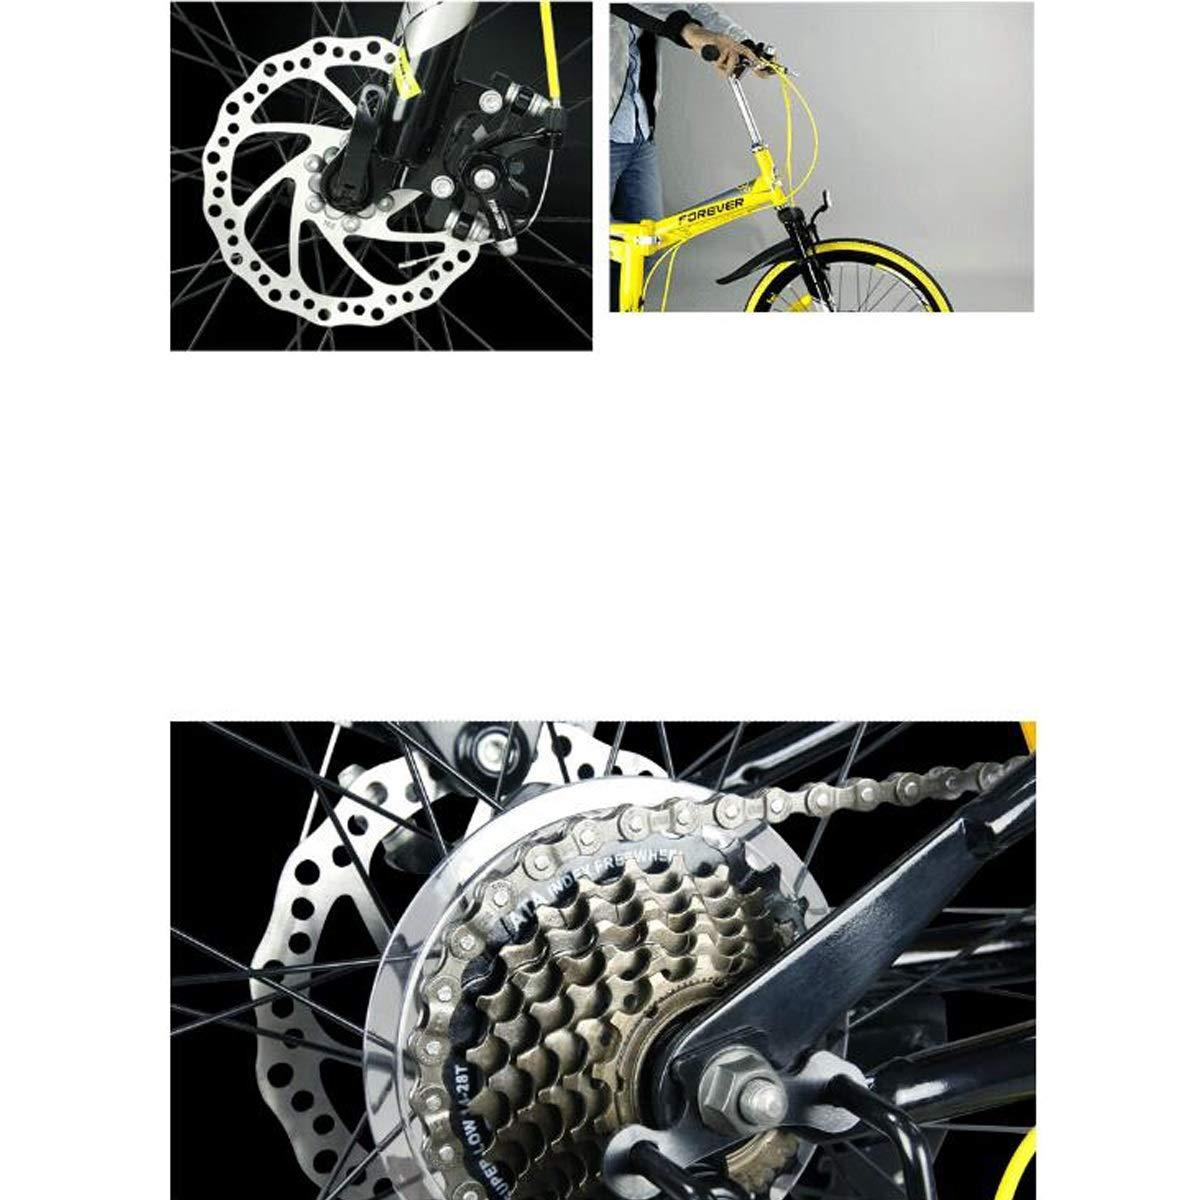 Kehuitong Bicicleta, Bicicleta Plegable, Bicicleta de 7 ...